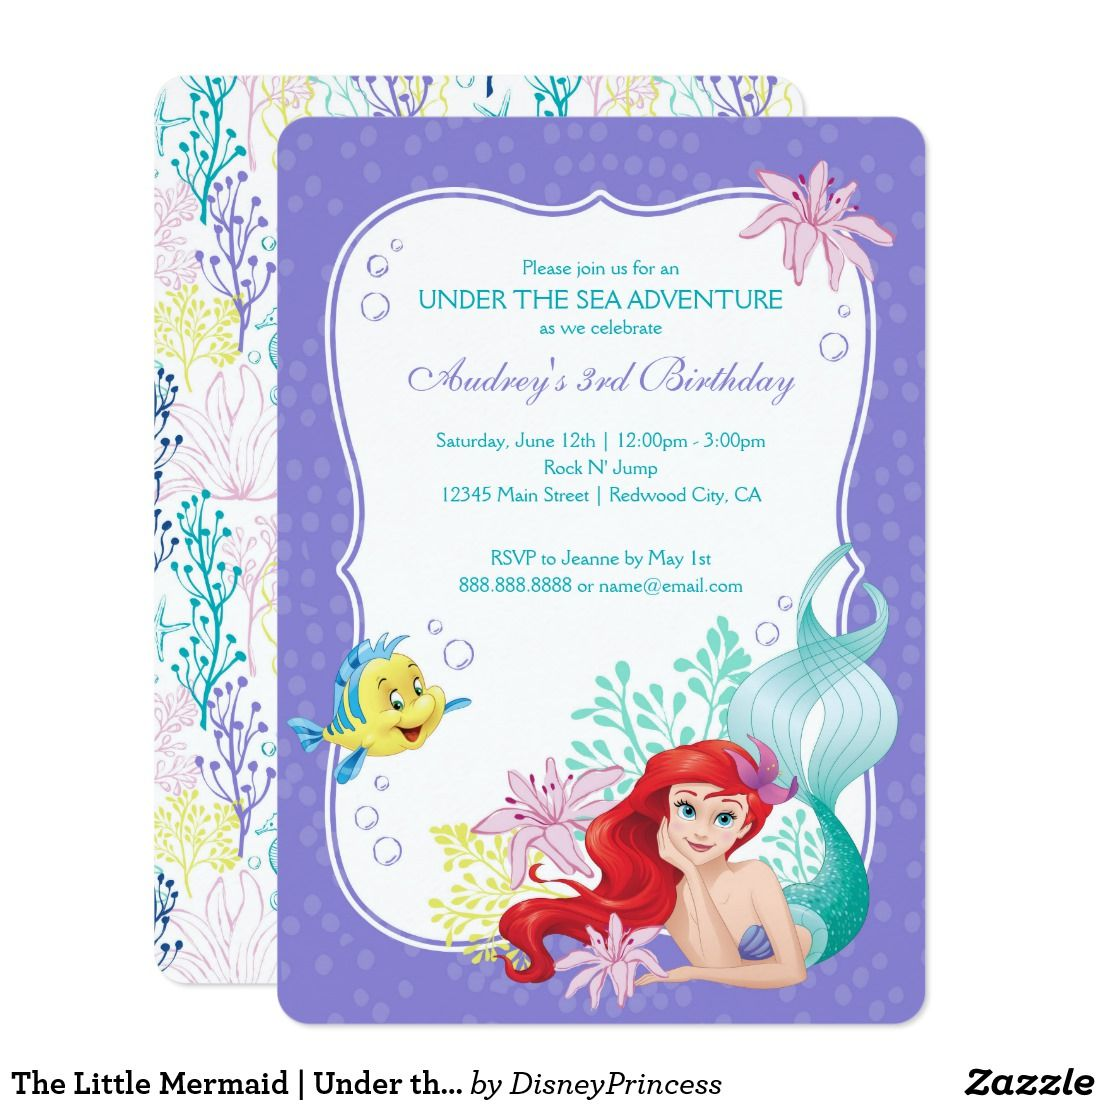 The little mermaid under the sea birthday invitation in